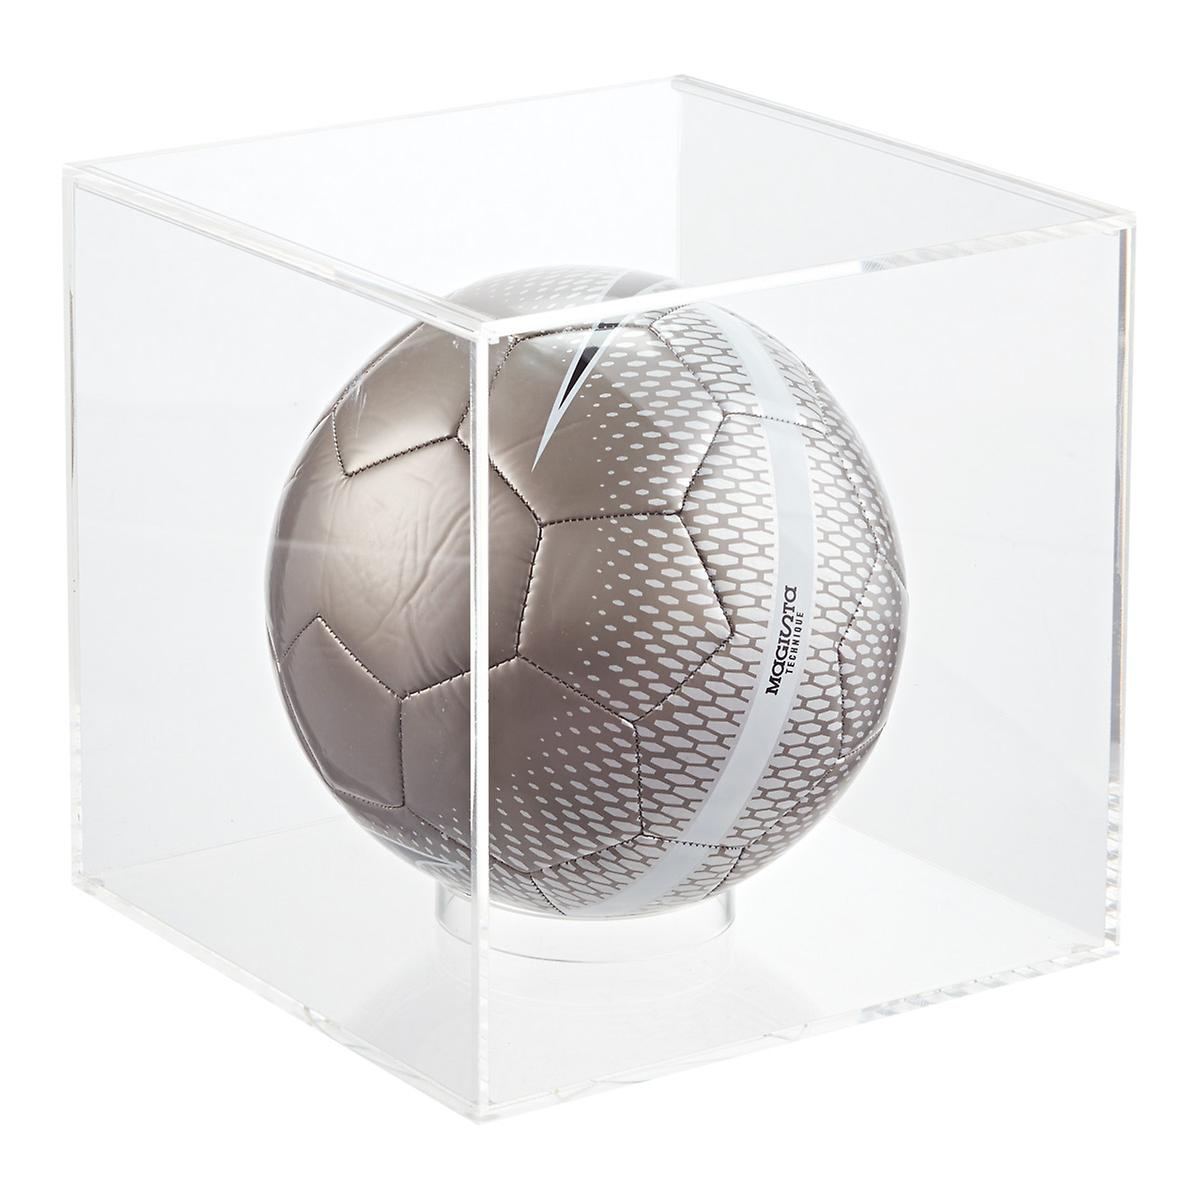 Acrylic Basketball & Soccer Display Cube